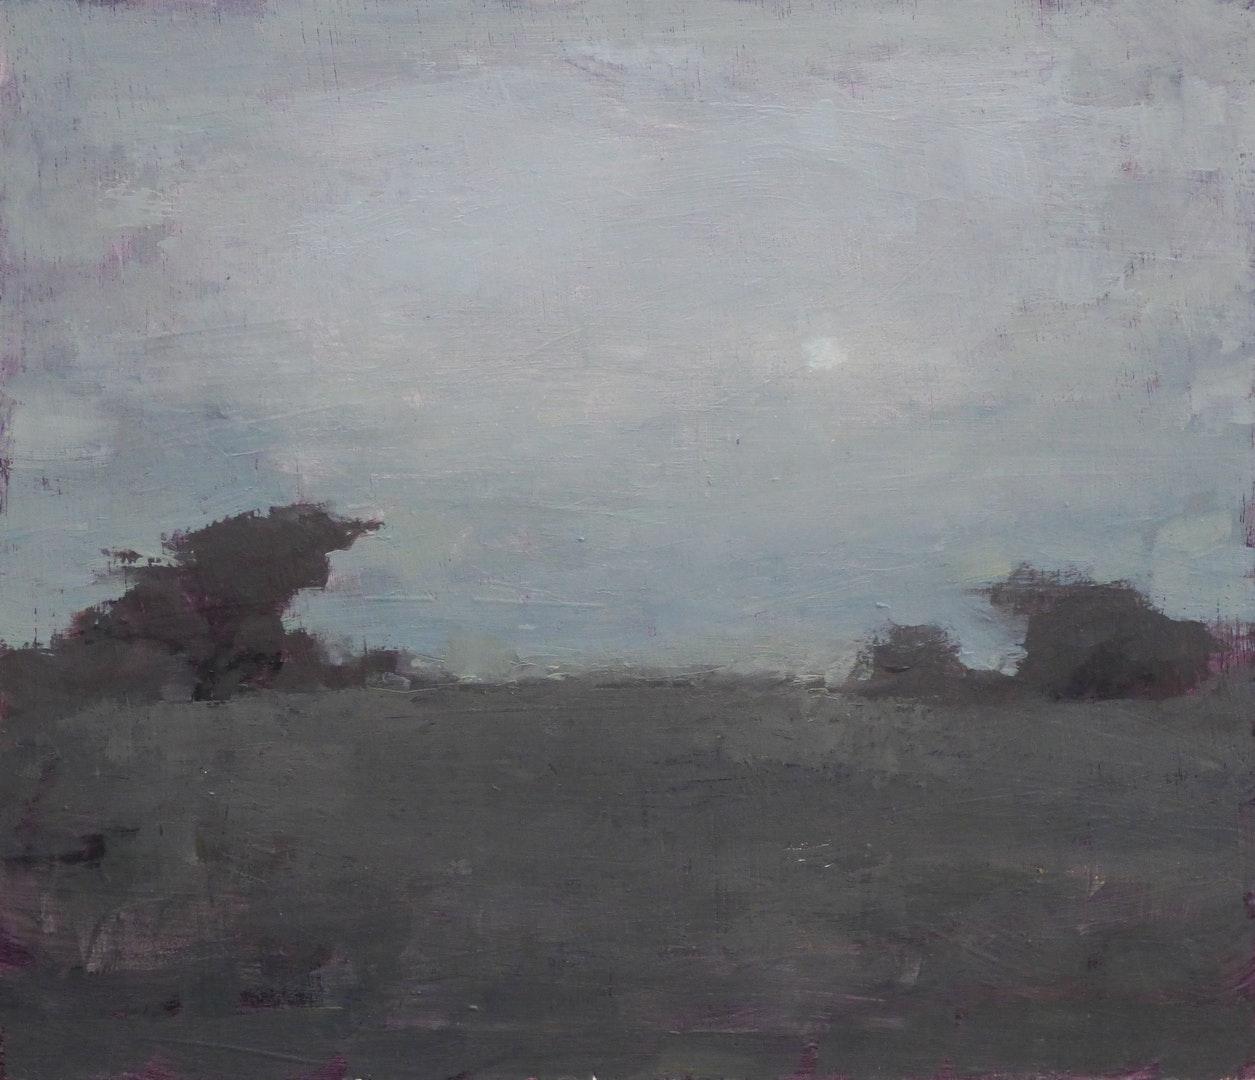 'Harmony In Grey', Max White, Oil on panel, 15 x 20 cm